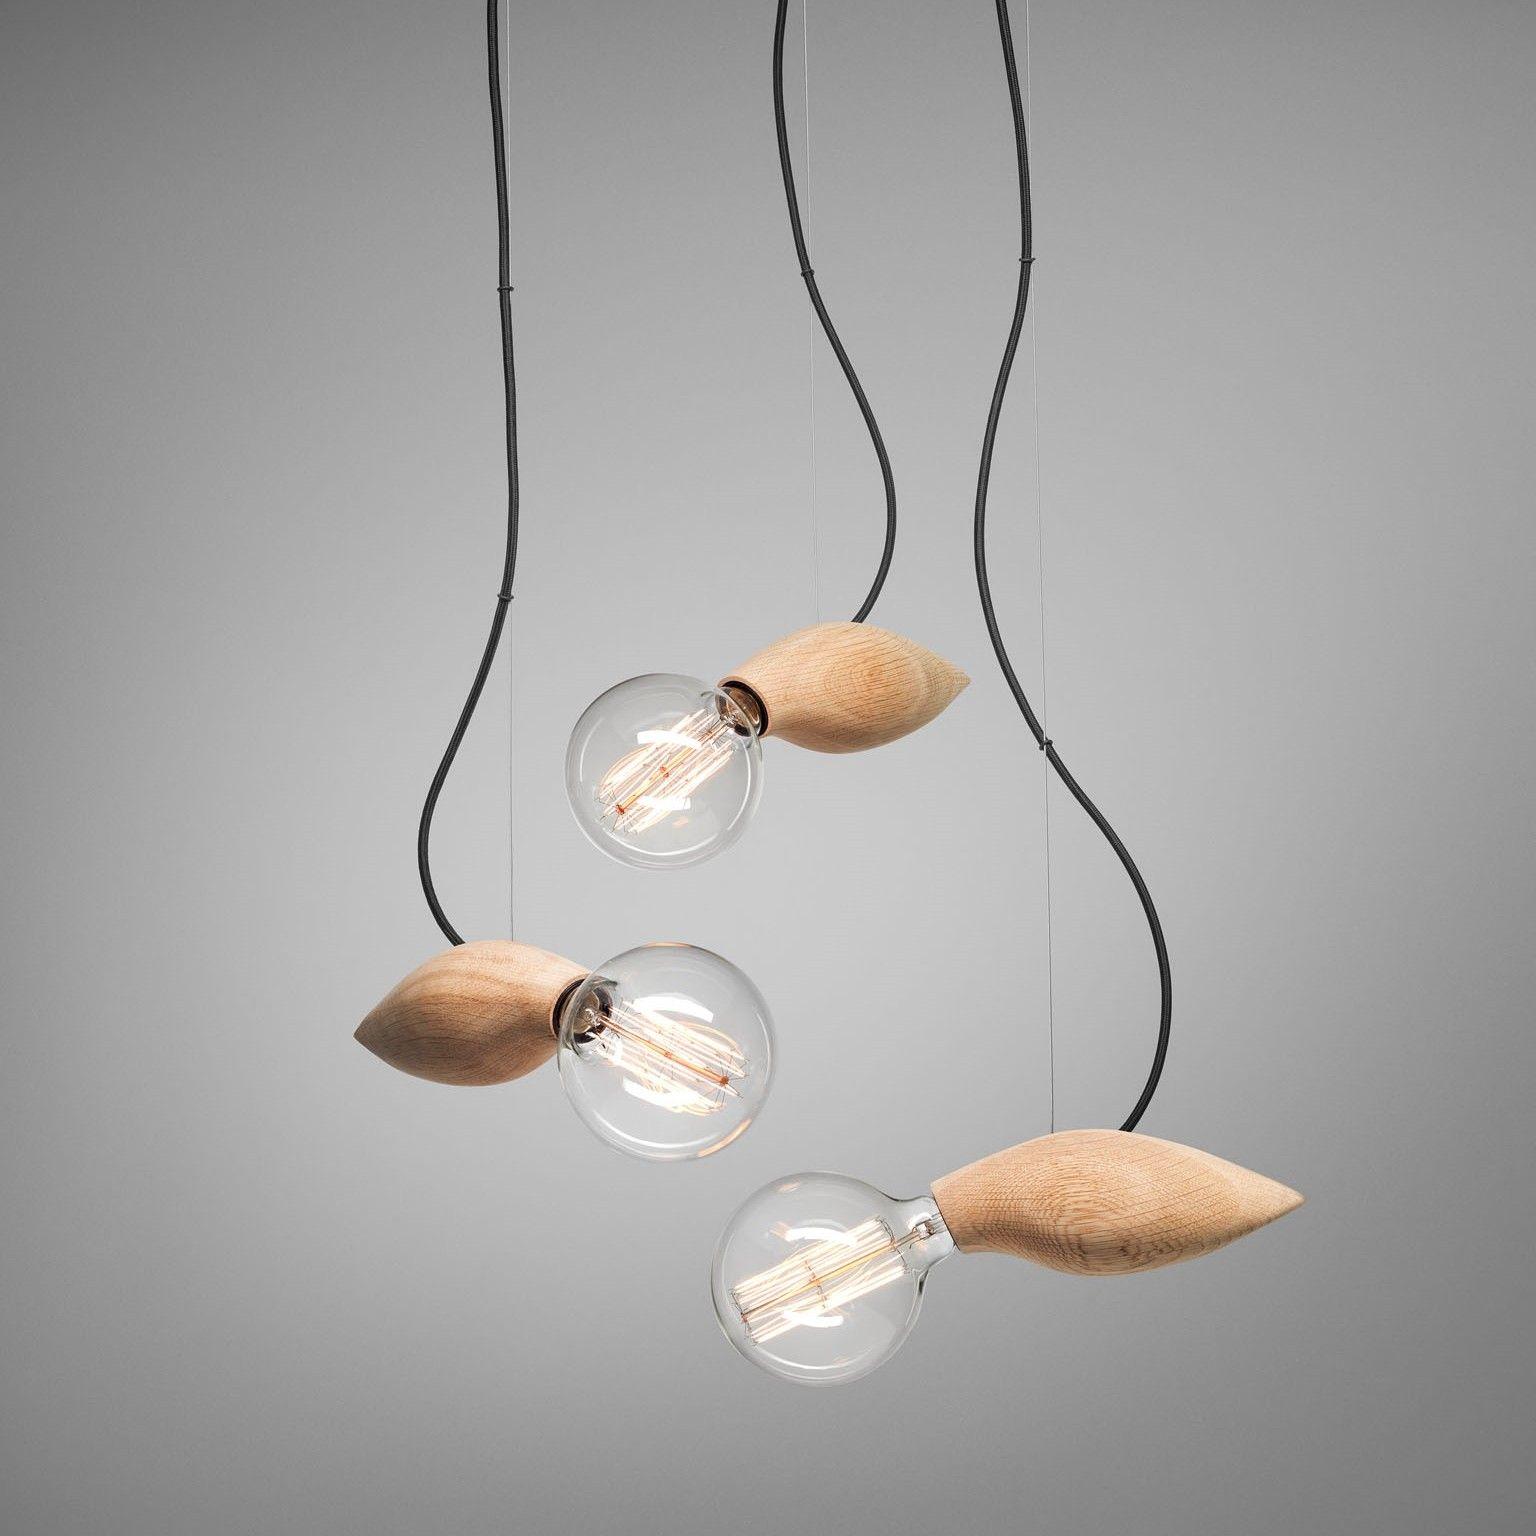 decovry.com - Jangir Maddadi | Swarm Lamp - set van 5